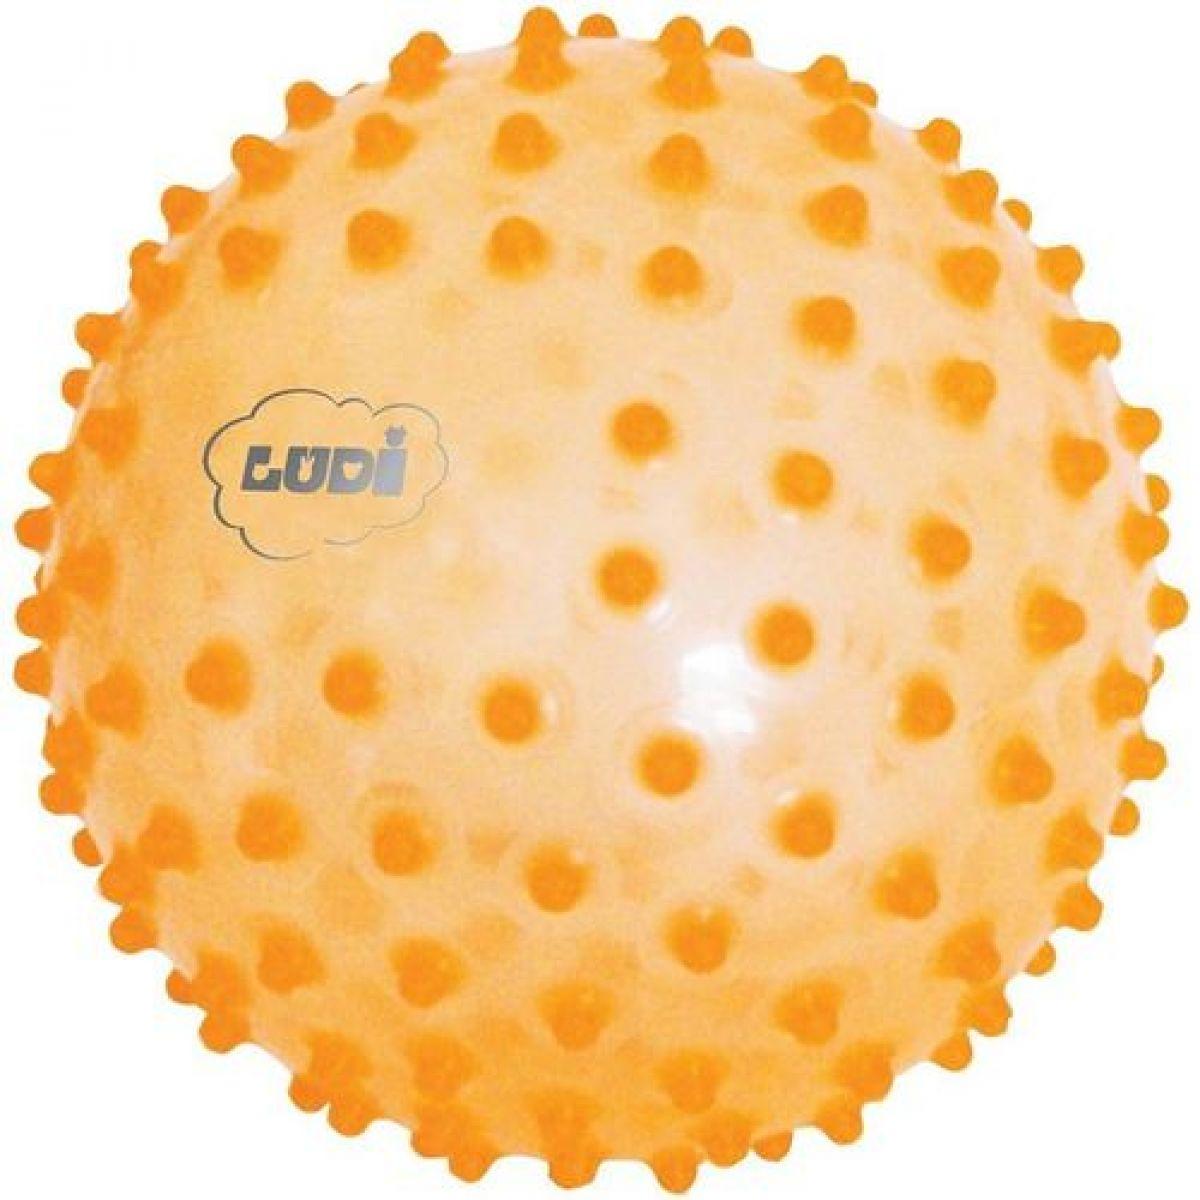 Ludi Senzorický míček 20cm oranžový